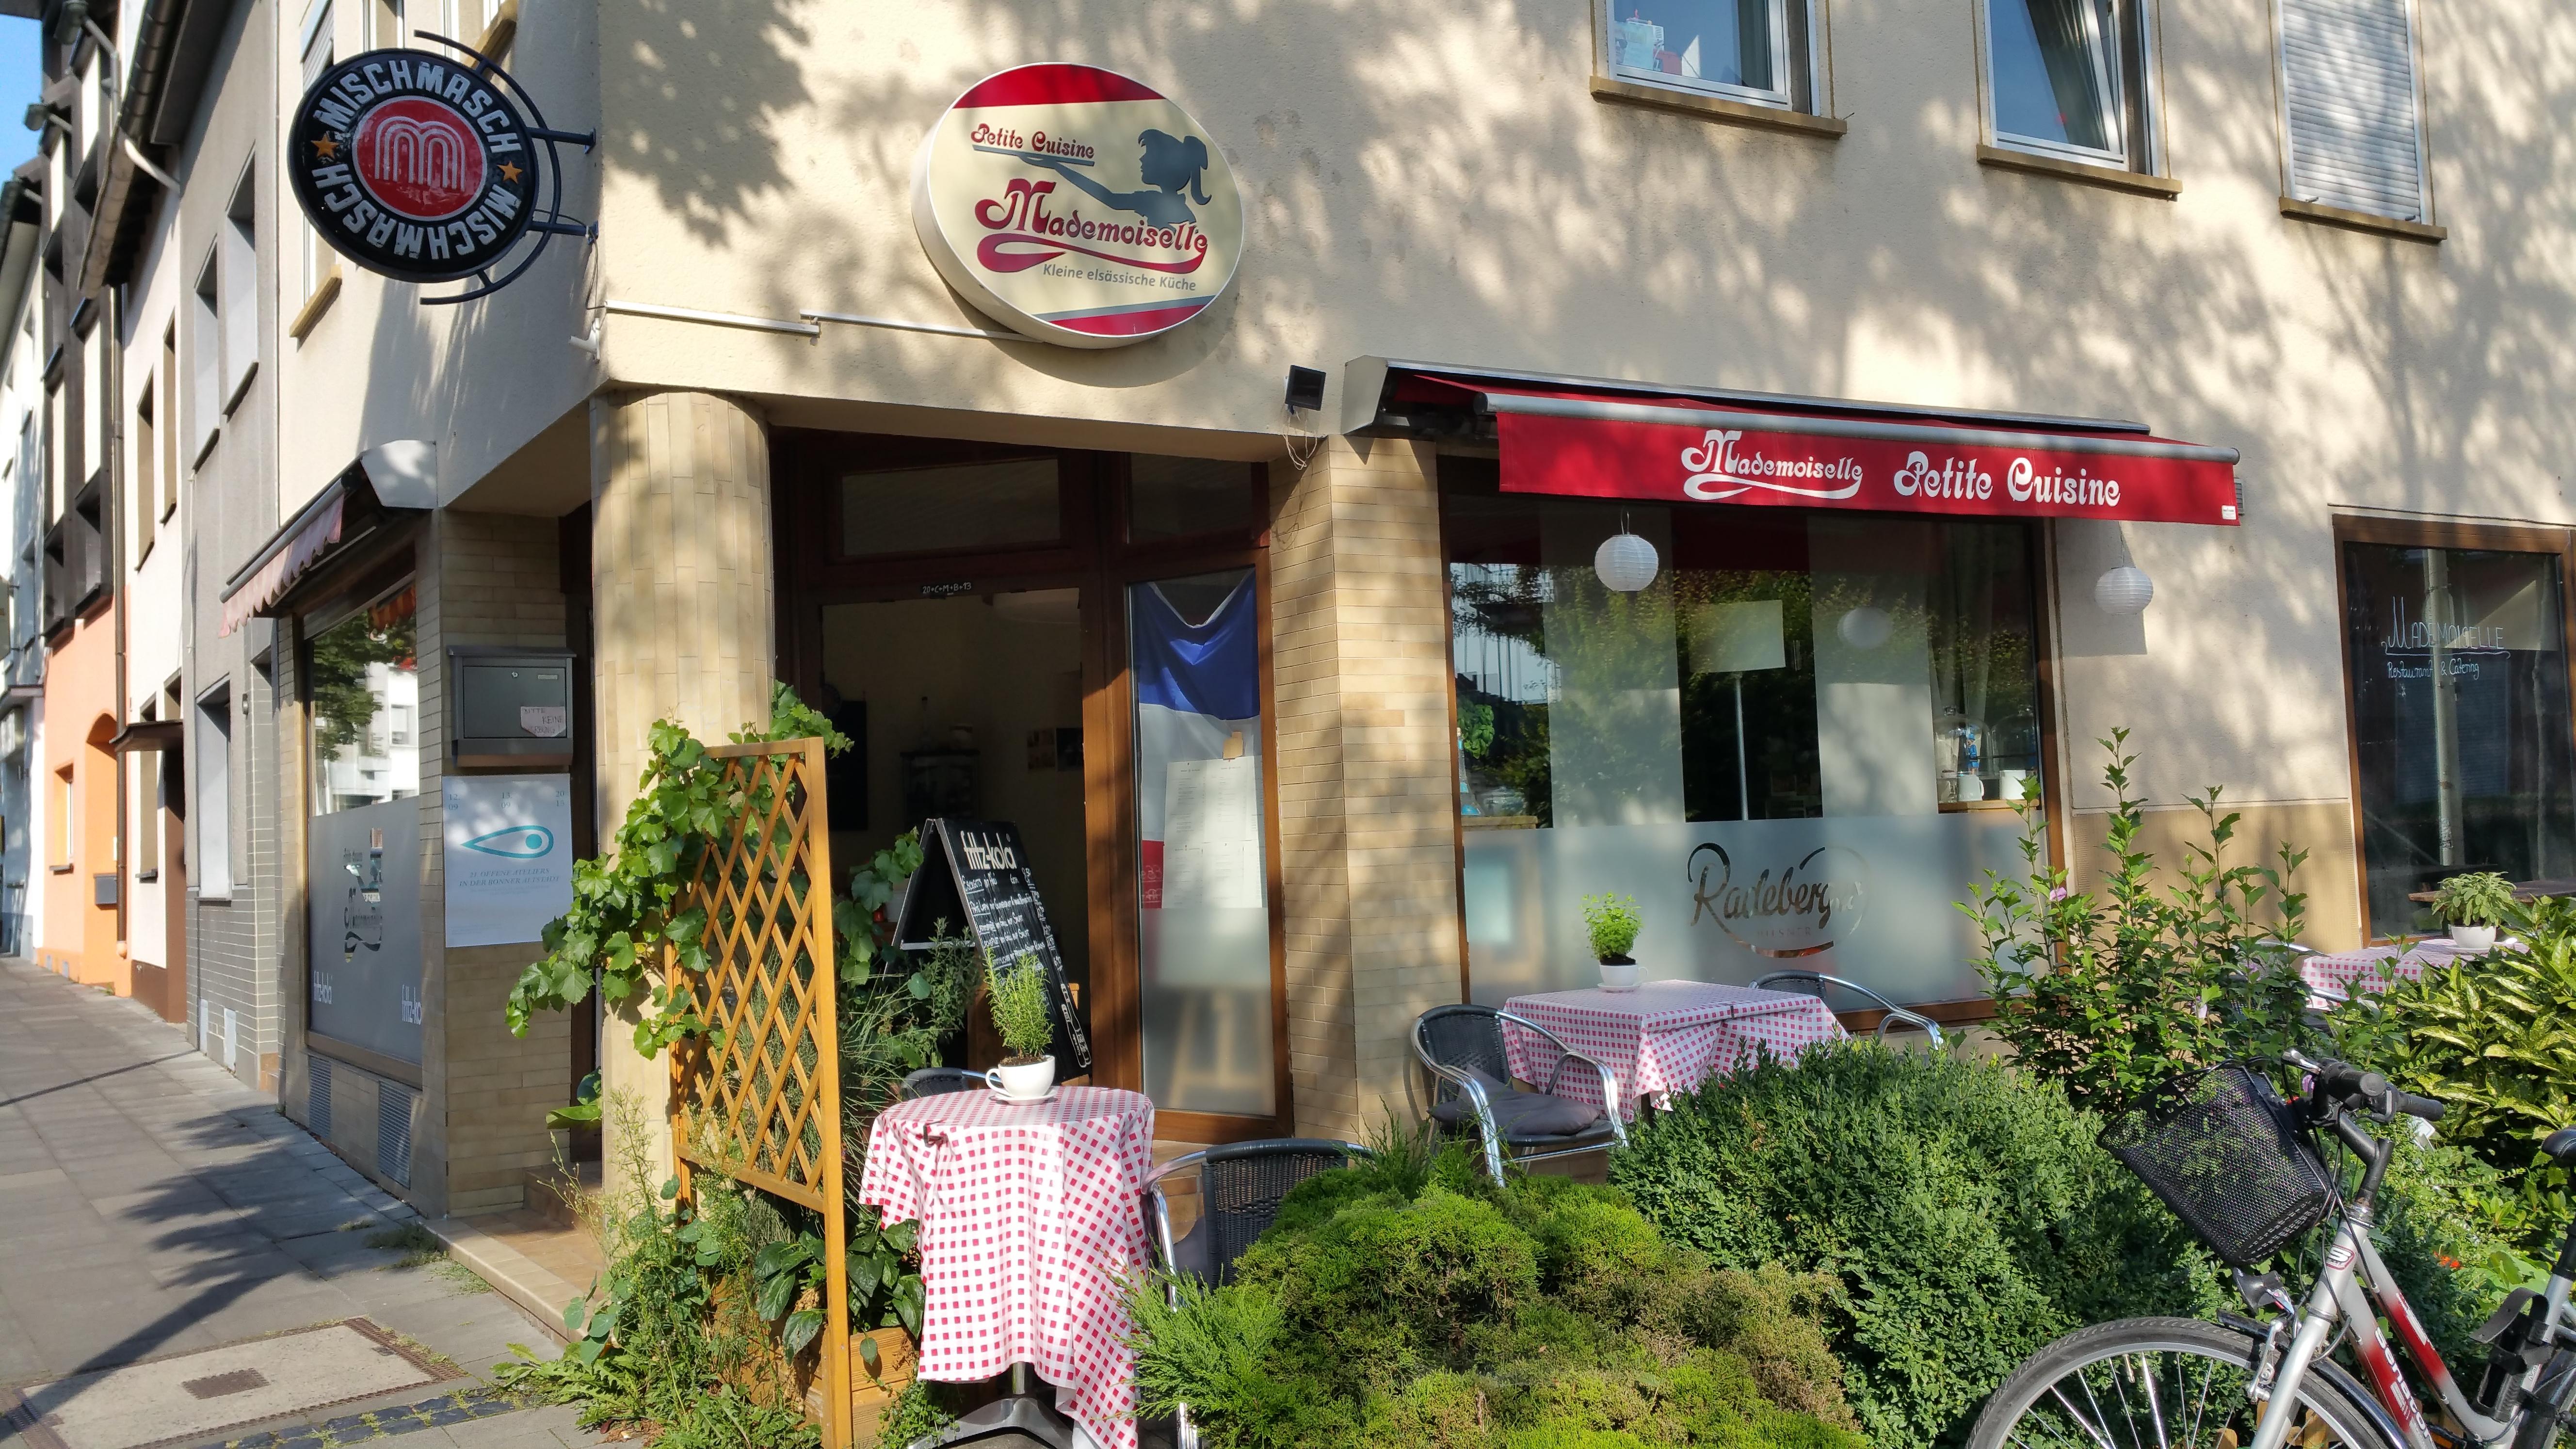 Bonn Mademoiselle Petite Cuisine Bonn Geht Essen